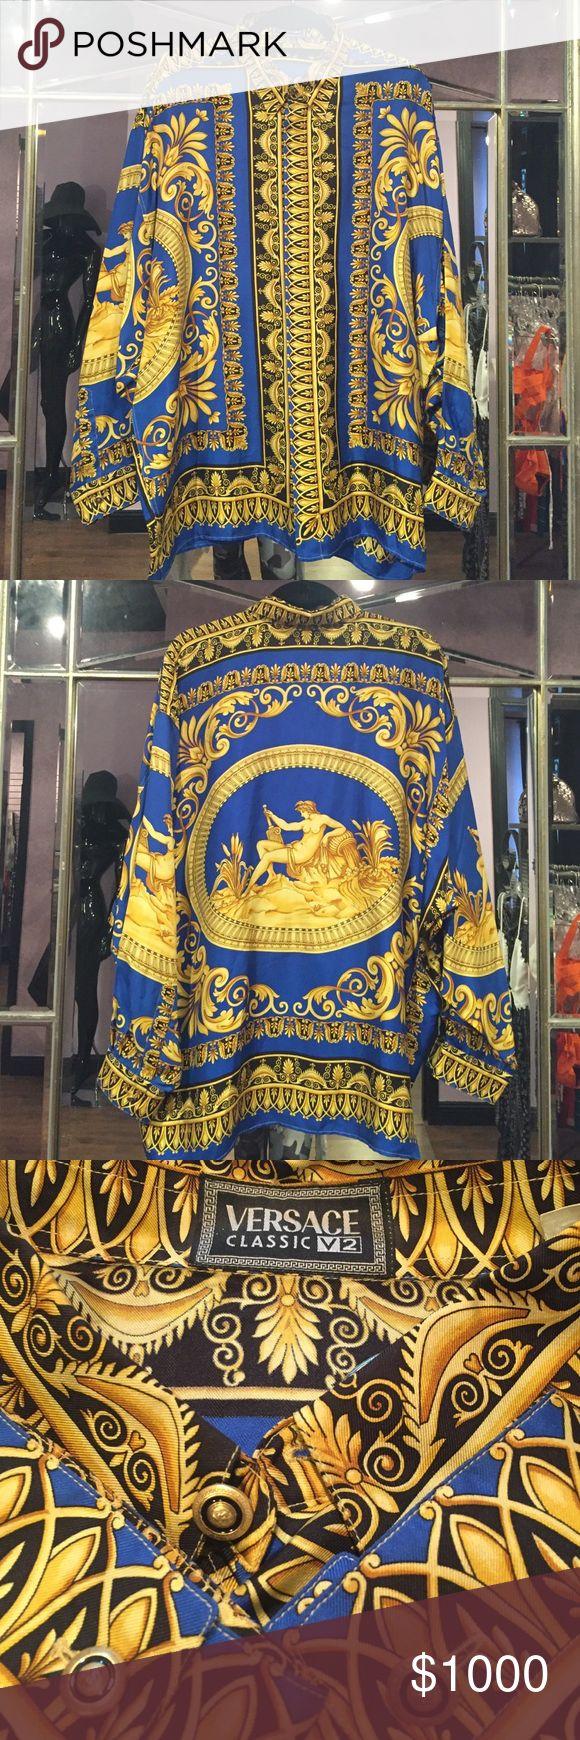 ⚜️ Versace Vintage Silk Shirt In perfect flawless condition authentic Versace %100 Silk Shirt. Size XXL ⚜️ Versace Shirts Dress Shirts